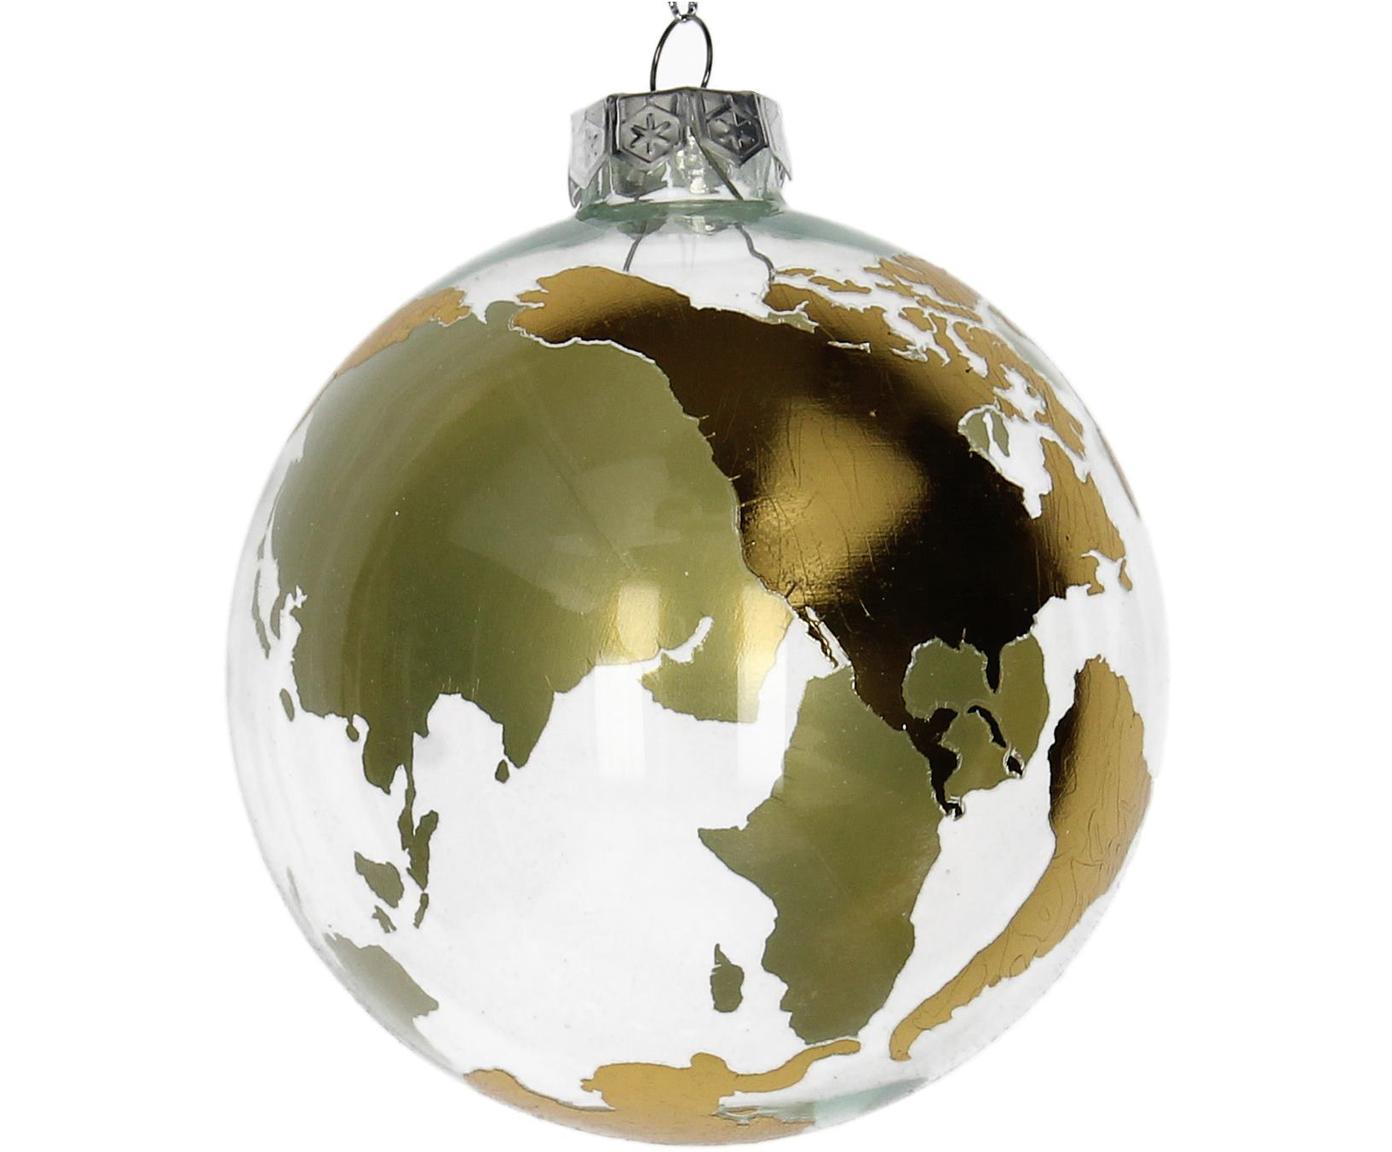 Weihnachtskugeln Globe Ø10cm, 2Stück, Goldfarben, Transparent, Ø 10 cm